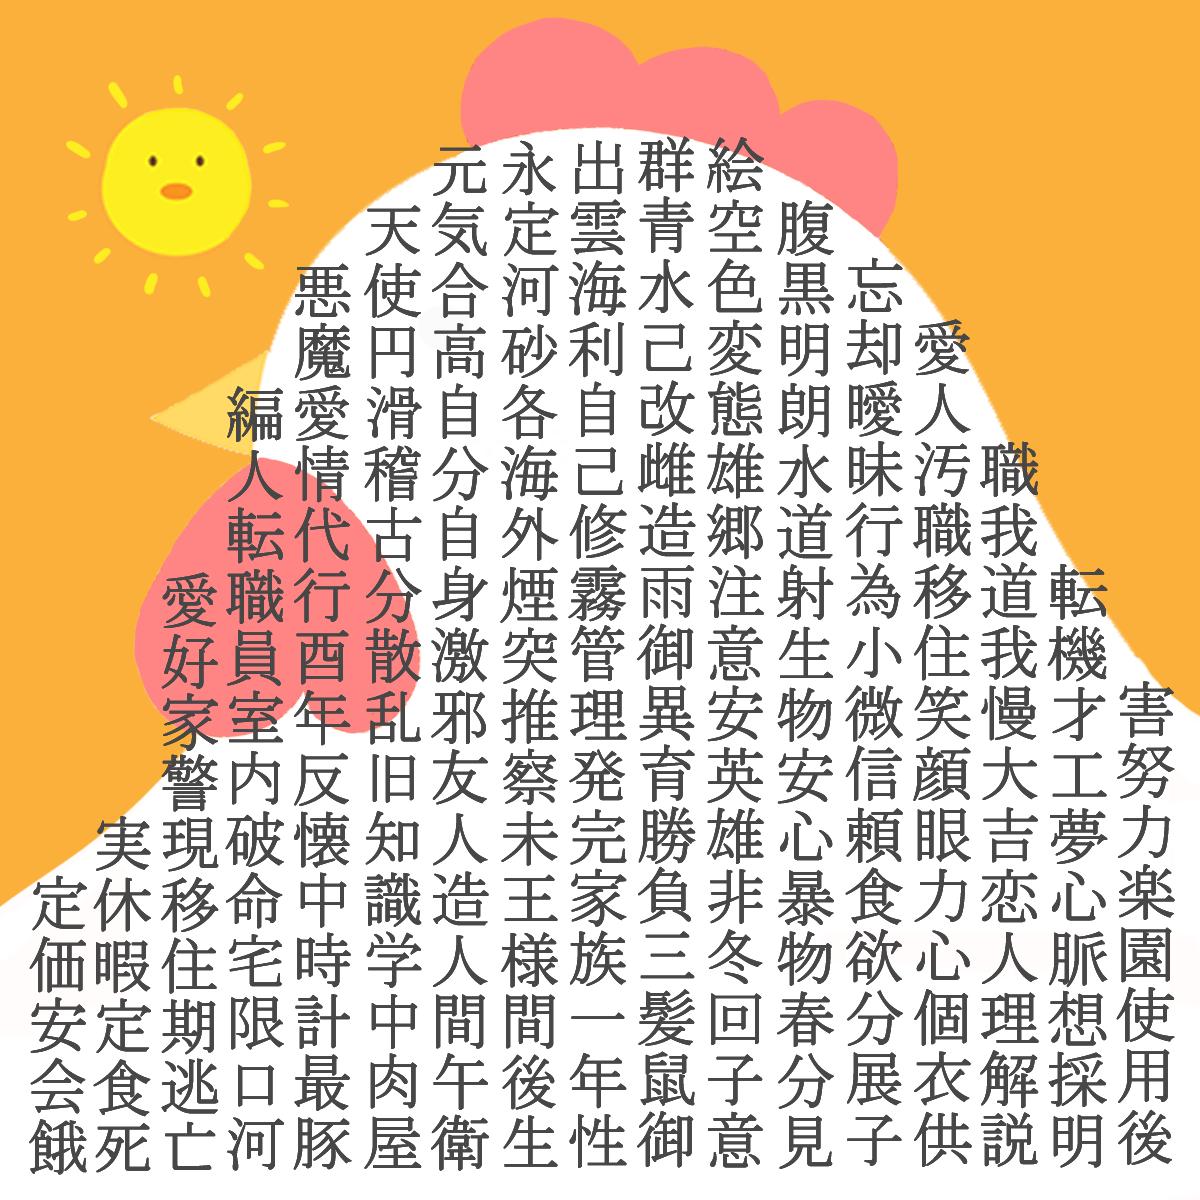 2017漢字診断 (1)